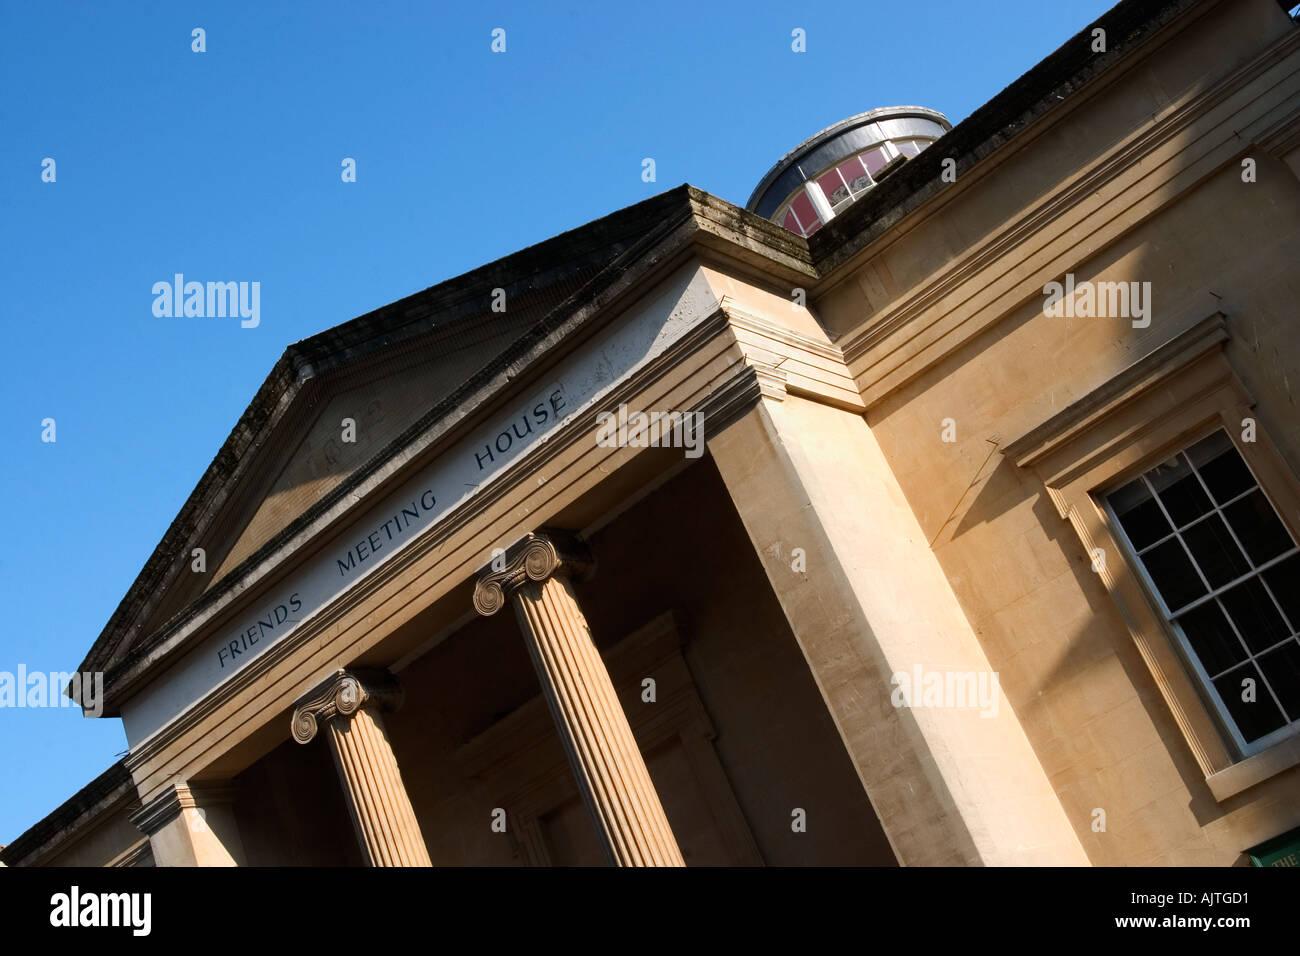 Friends Meeting House on York Street in Bath Somerset UK - Stock Image